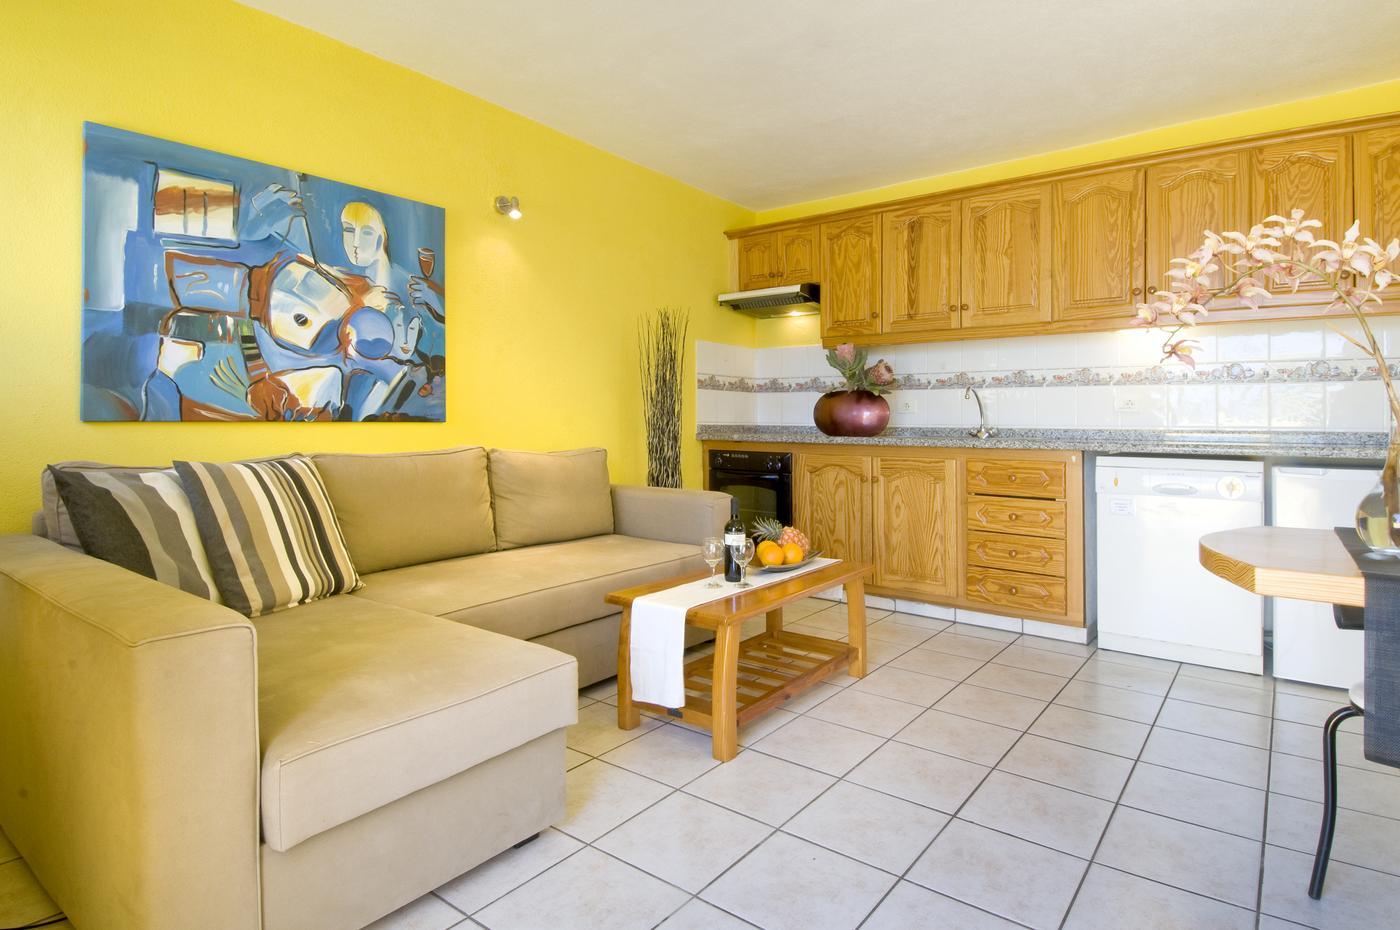 ferienhaus malaga mieten allein stehendes haus mit meerblick lapalma. Black Bedroom Furniture Sets. Home Design Ideas